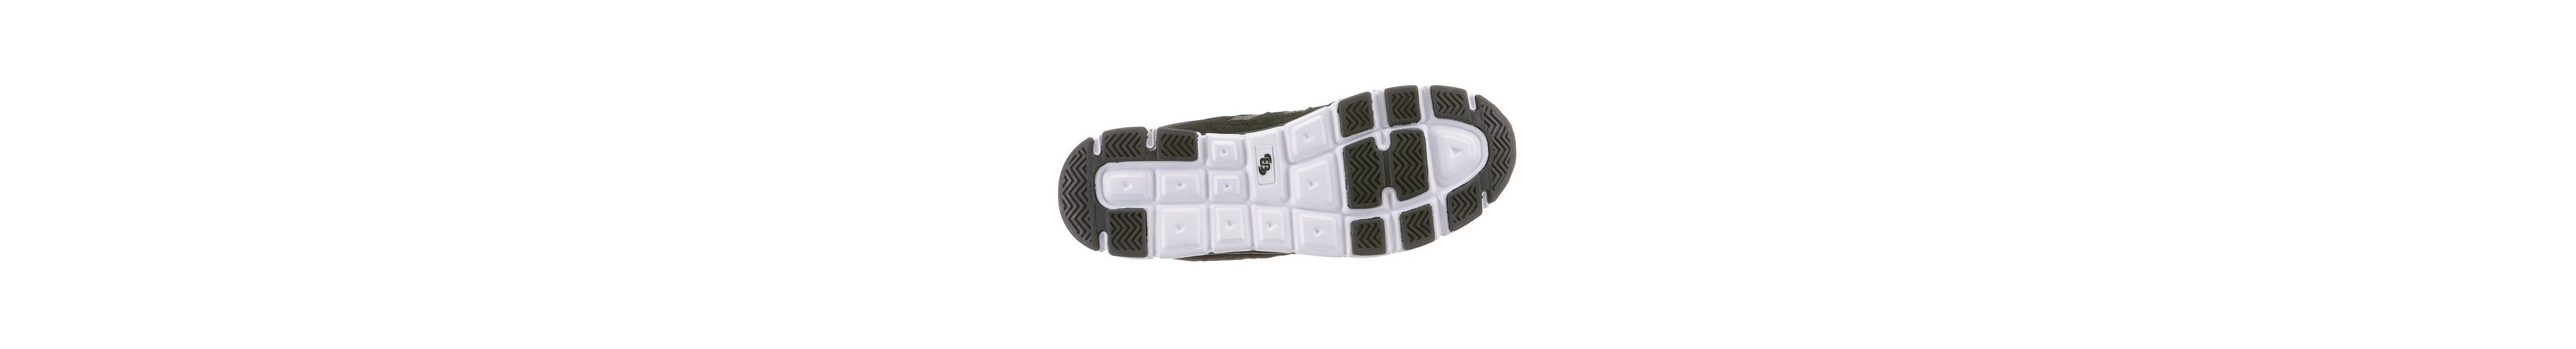 Slip Fit Spiridon mit Sneaker BR脺TTING herausnehmbarer BR脺TTING Spiridon Textilinnensohle In n6CfHwBqx